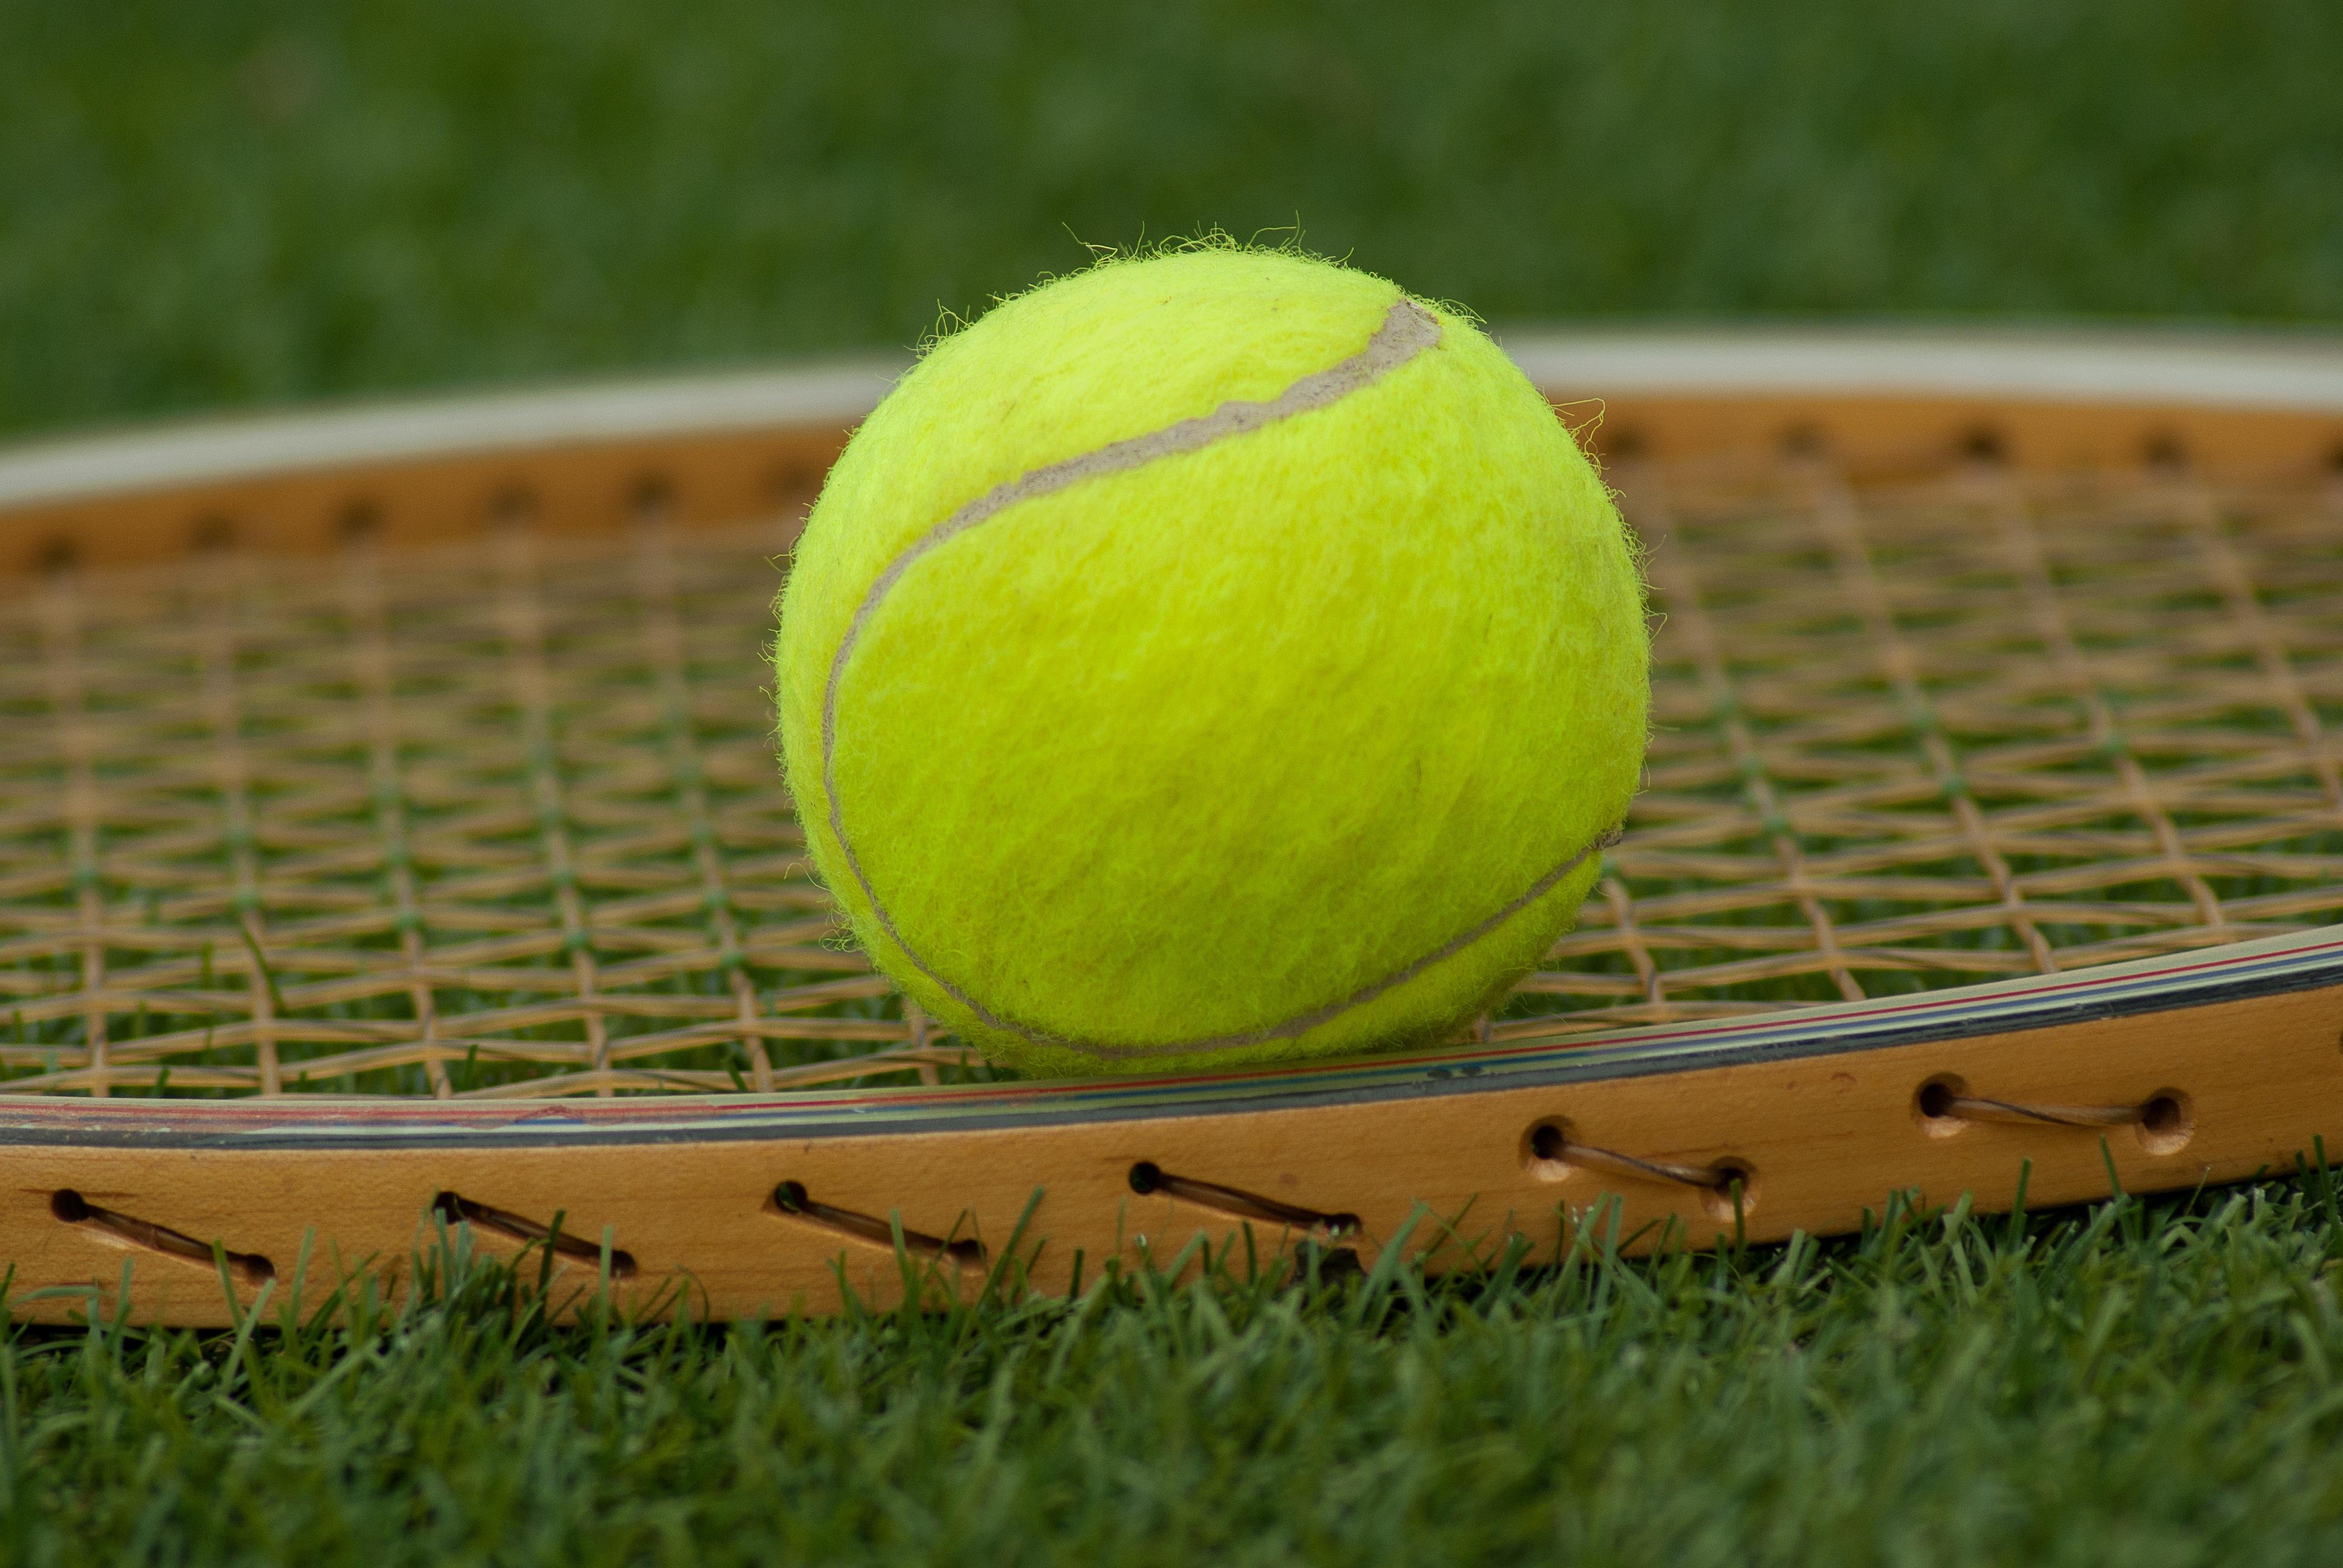 fc2e82e8 gress sport grønn gul sportsutstyr tennis nett ball rekkert tennisball  tennisracket tilbehør